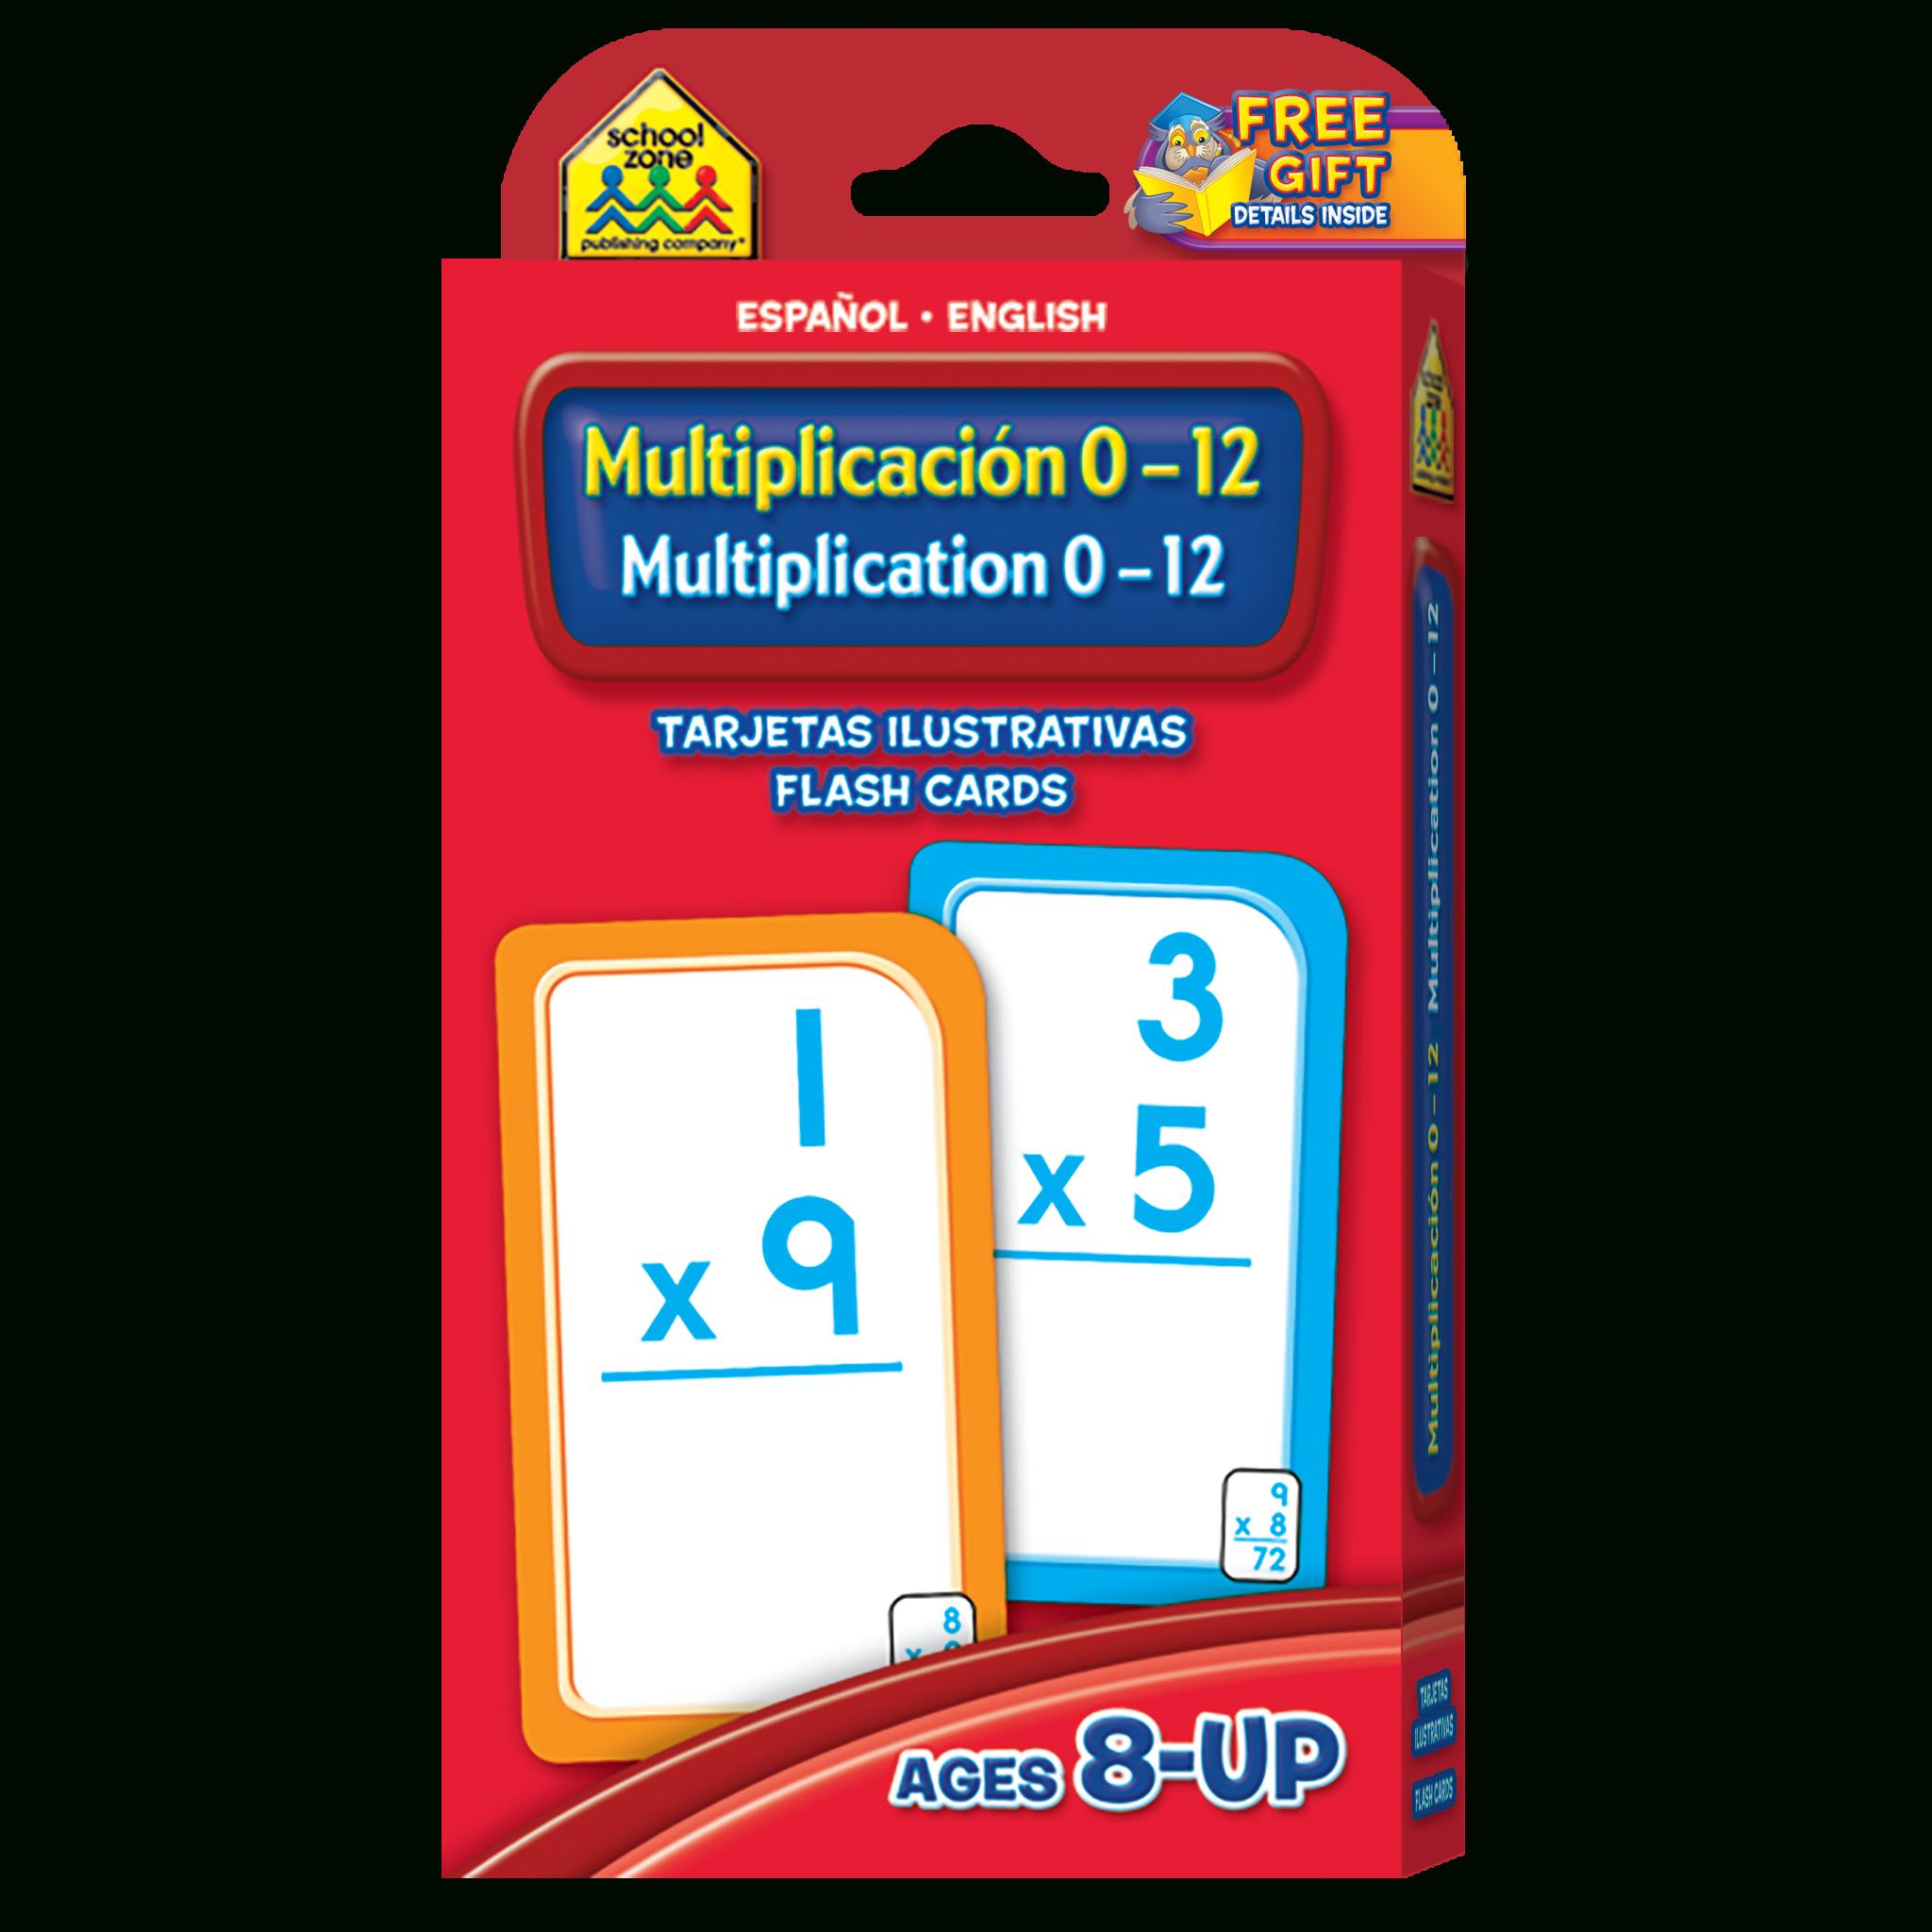 Bilingual Multiplication 0-12 Flash Cards (Multiplicacion 0-12 Tarjetas  Ilustrativas) in Printable Multiplication Cards 0-12